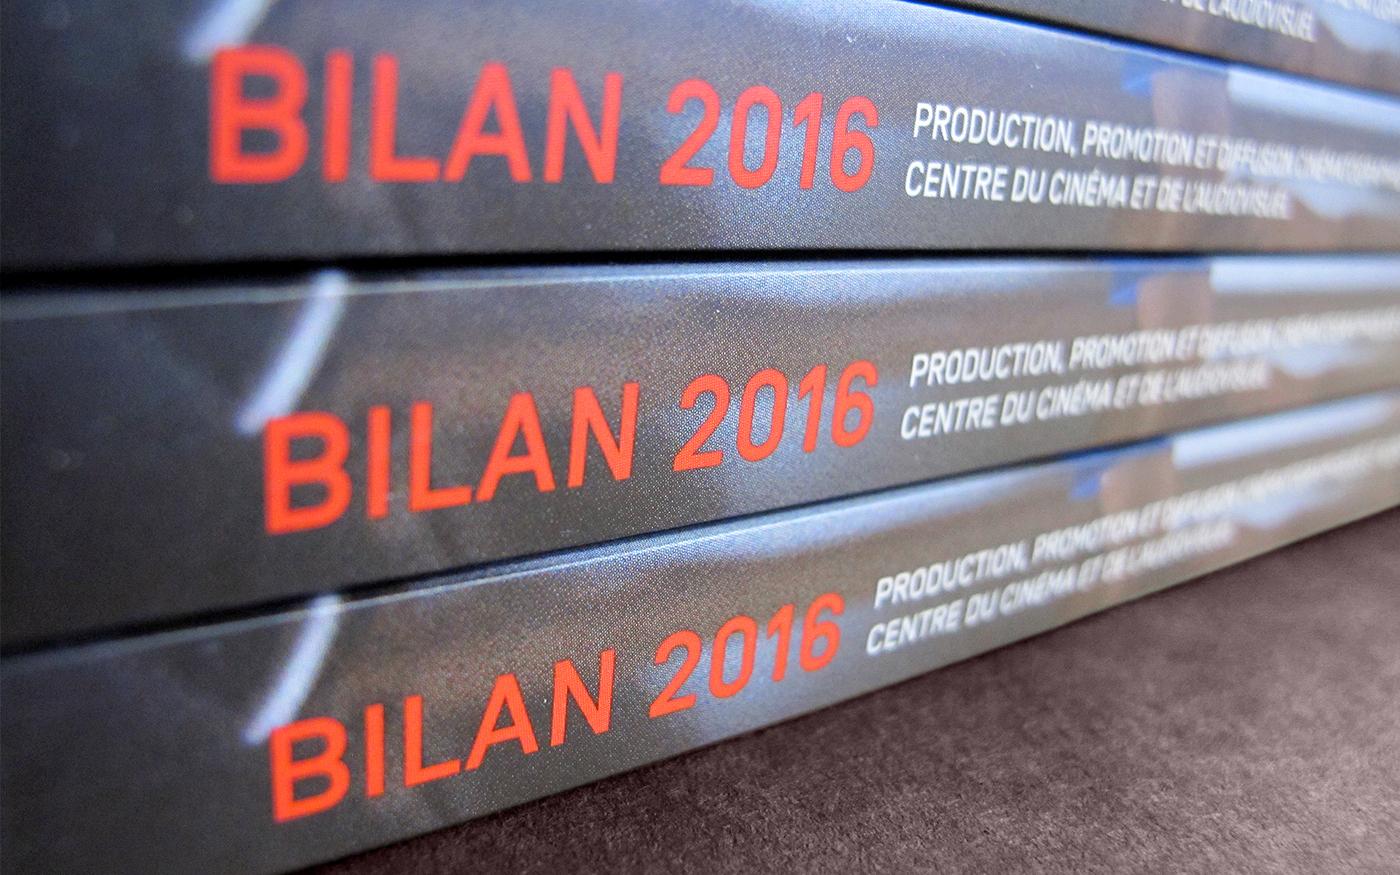 annual report rapport annuel Cinema francophones Production Promotion